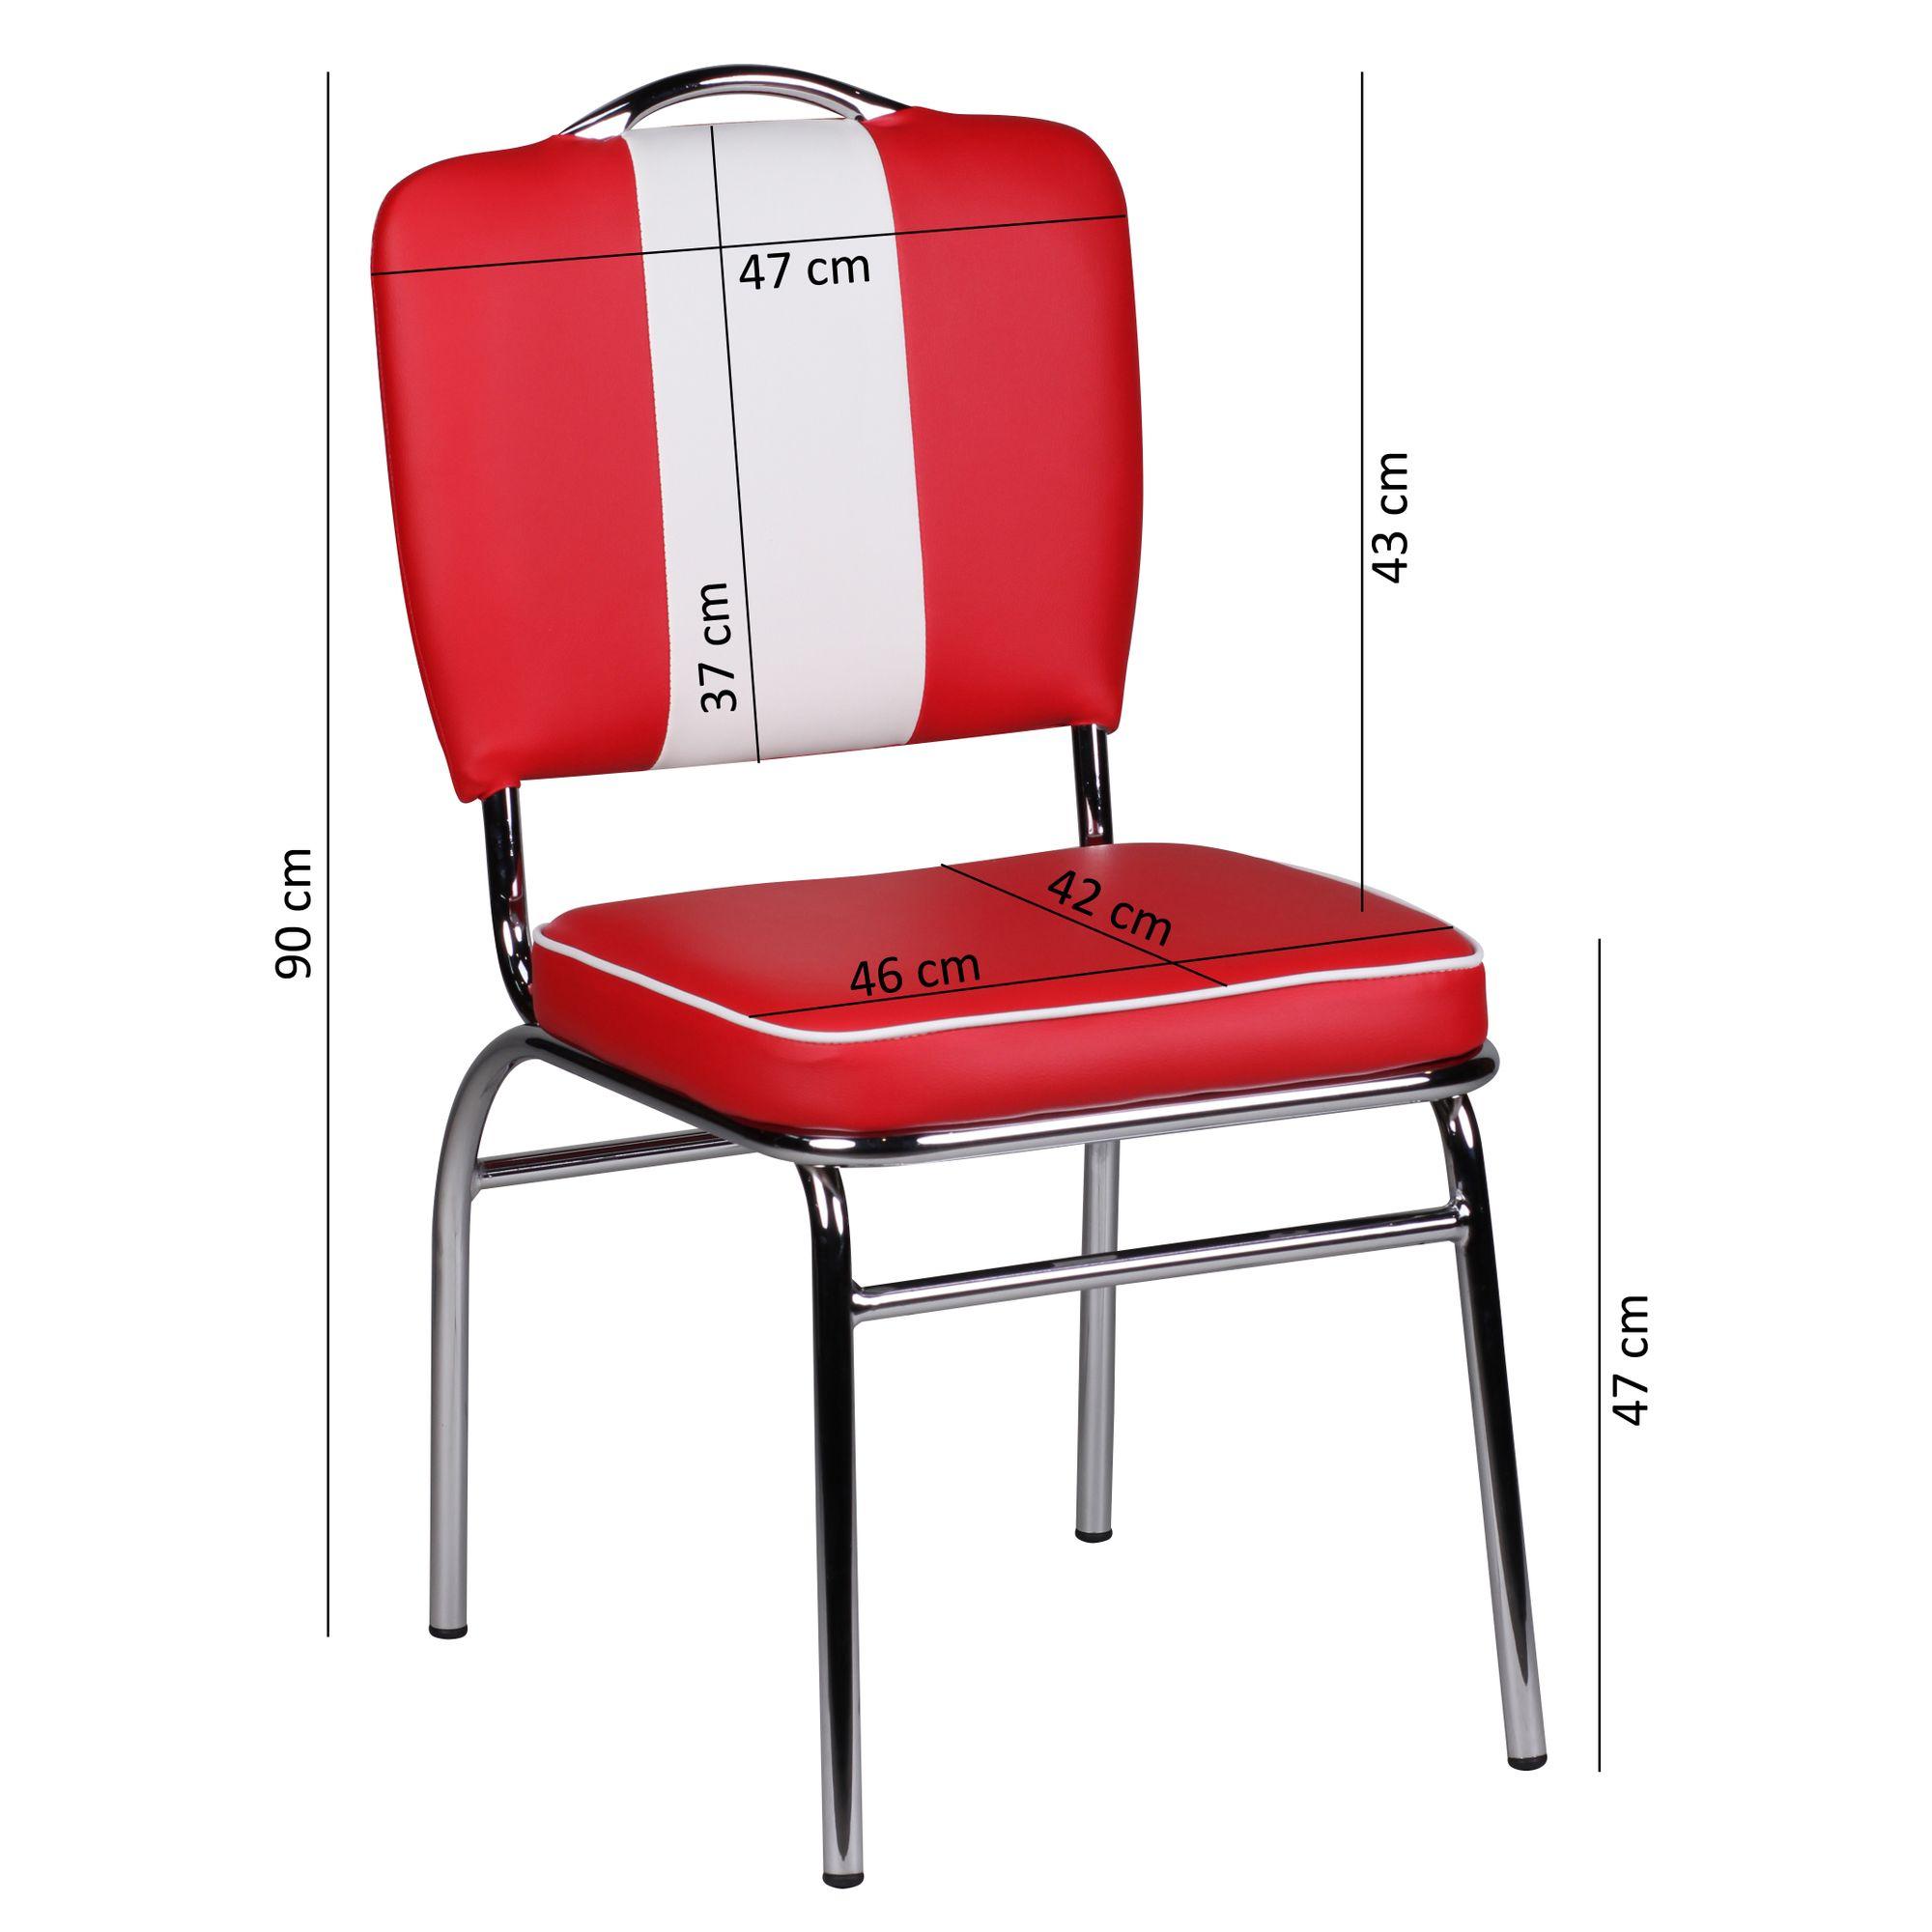 4er Set Esszimmerstühle American Diner Stühle 50er Jahre Retro Möbel Bistro